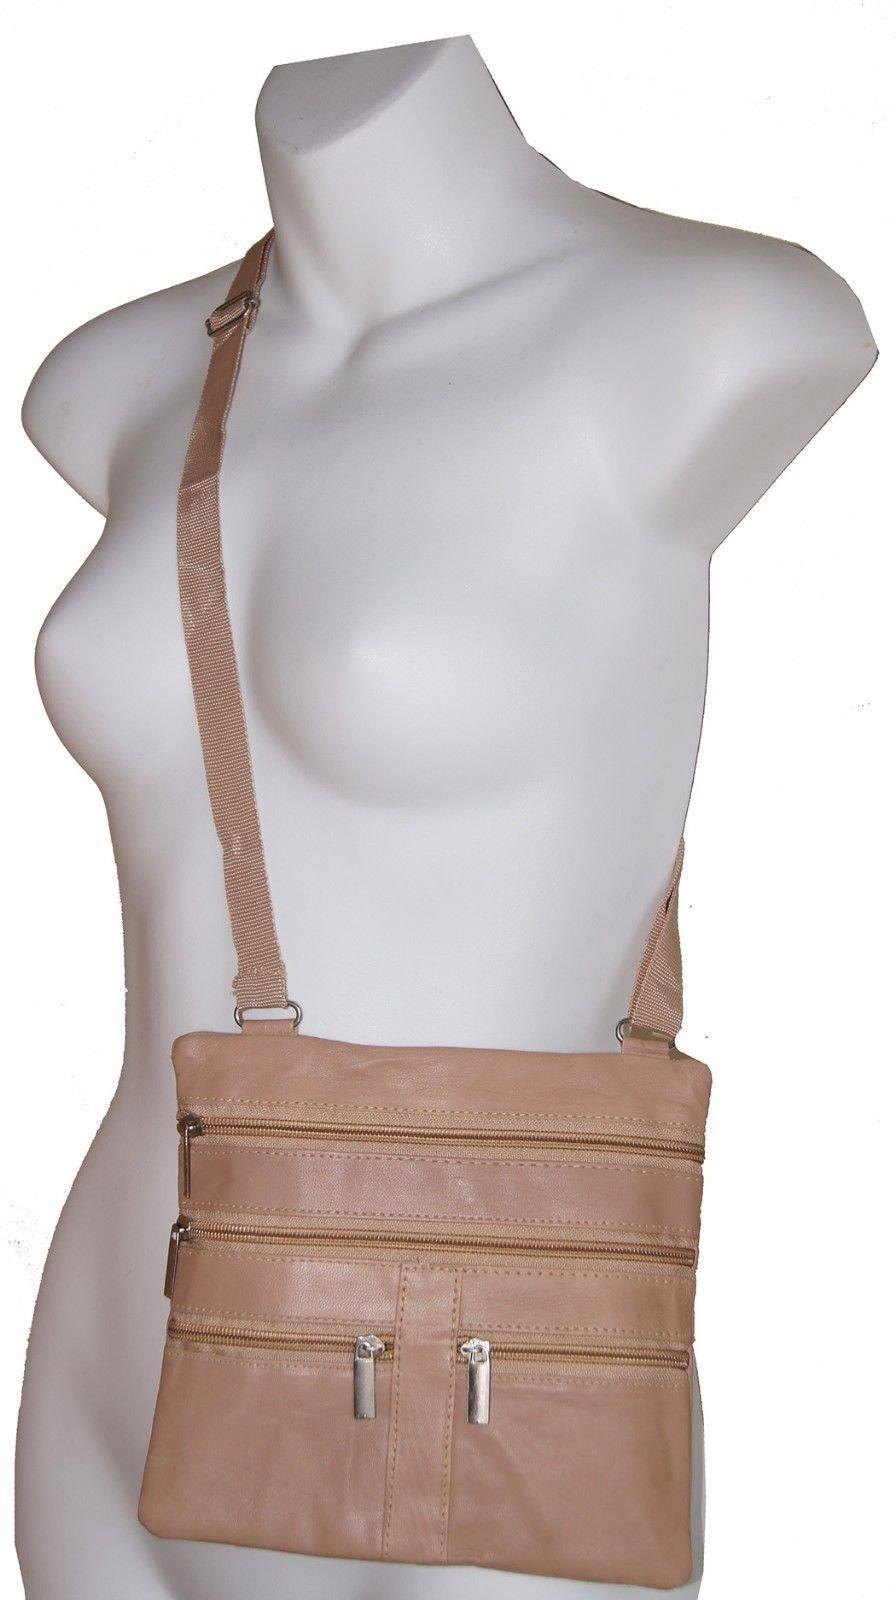 Beige Ladies Genuine Leather Cross Body Bag Satchel Messenger Bag 48'' Strap